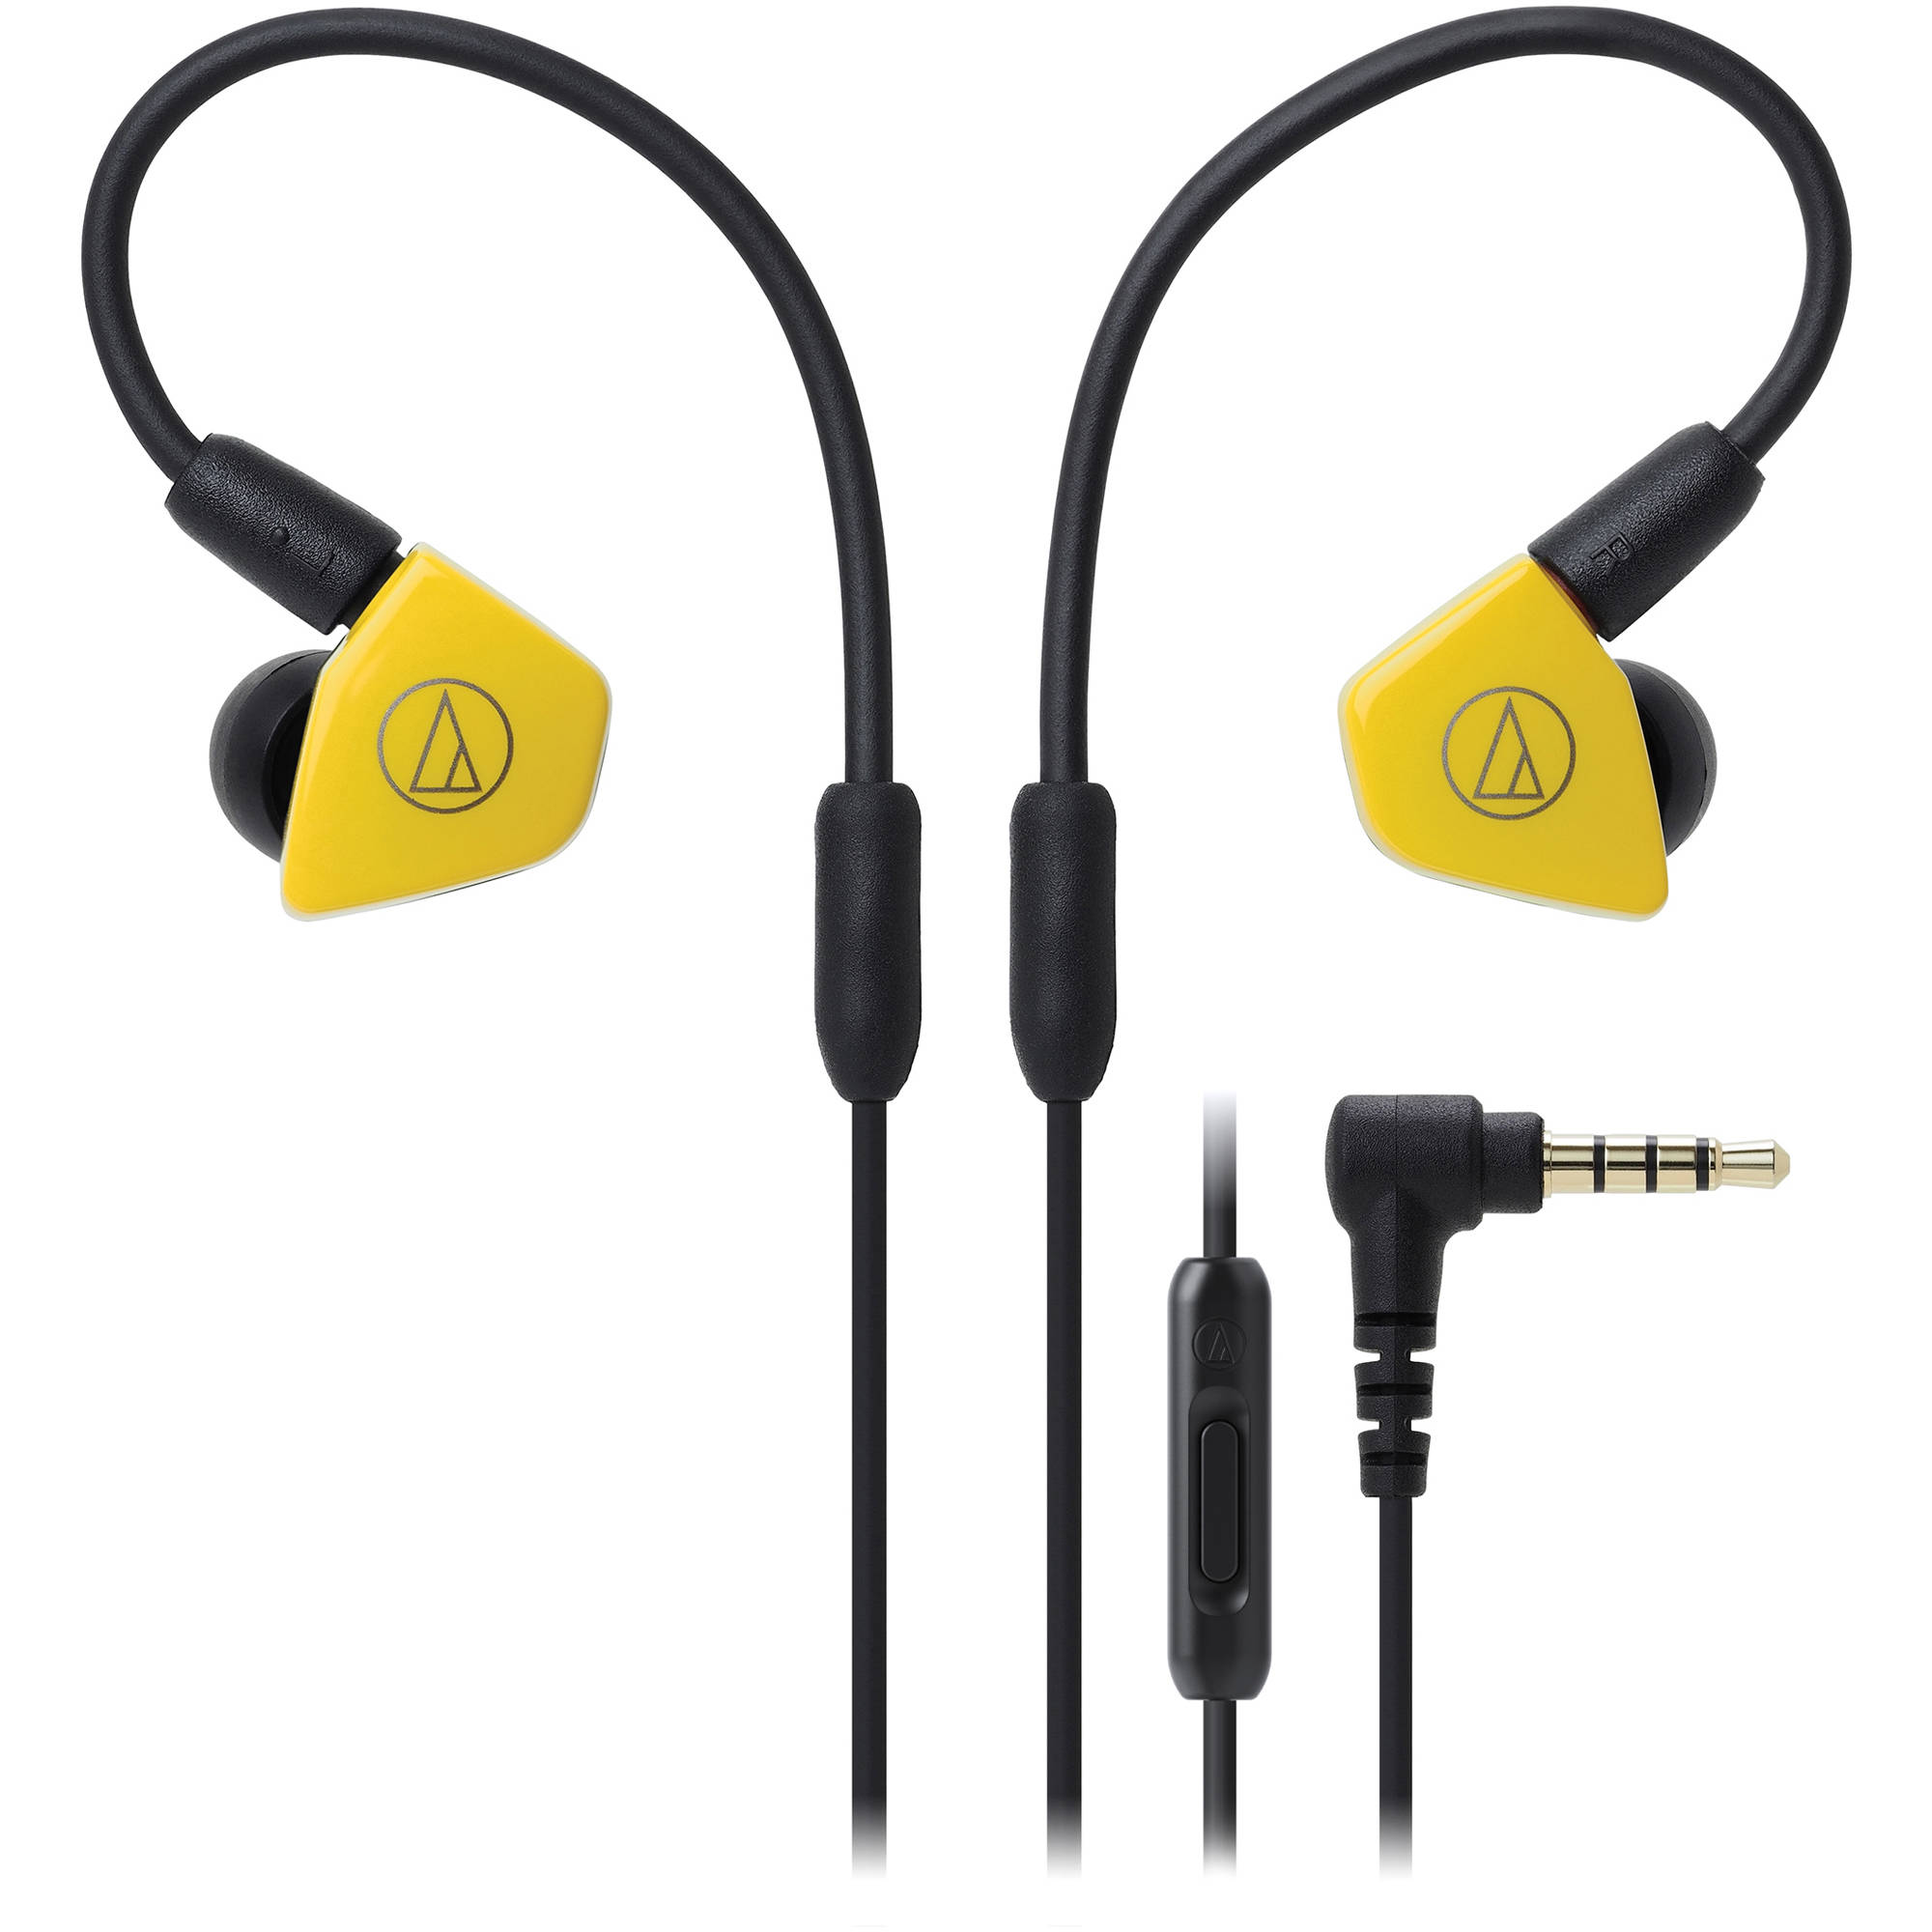 Audio-Technica ATH-LS50iS (15119538) - внутриканальные наушники (Yellow) наушники audio technica ath anc9